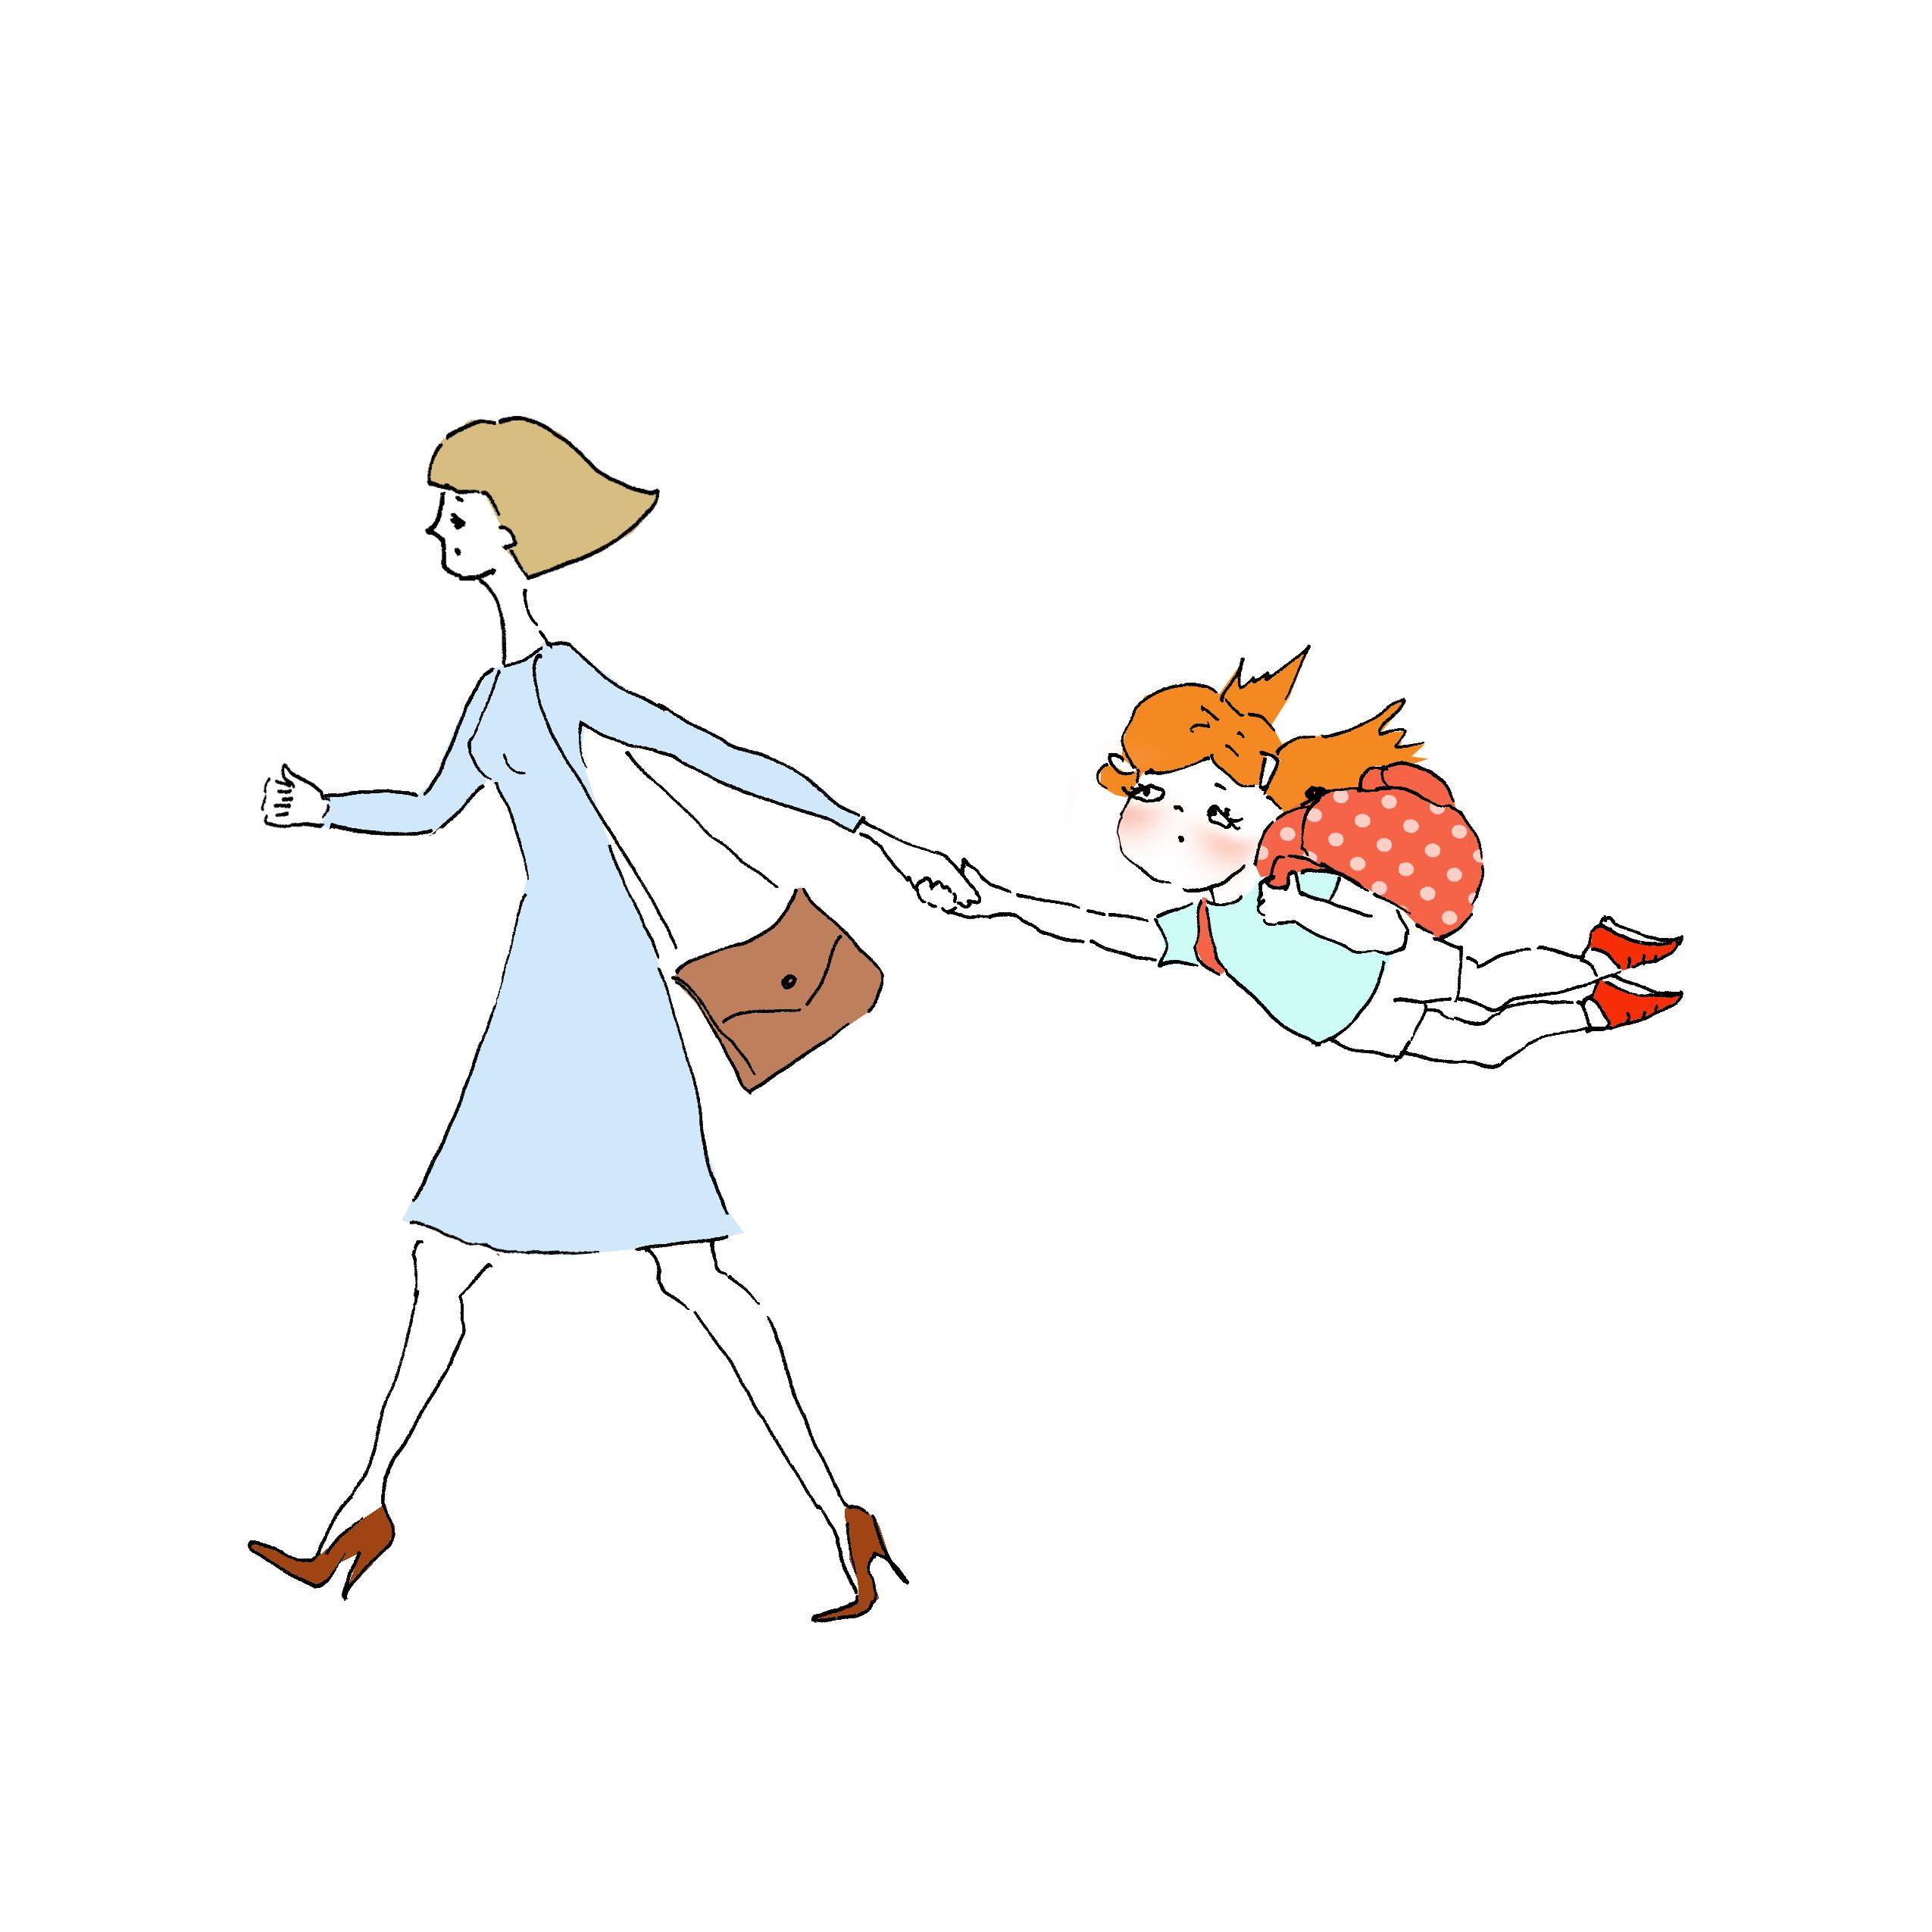 Мими&Китти – 10 – Мими опаздывает by Irena Brodeski - Illustrated by Irena Brodeski - Ourboox.com